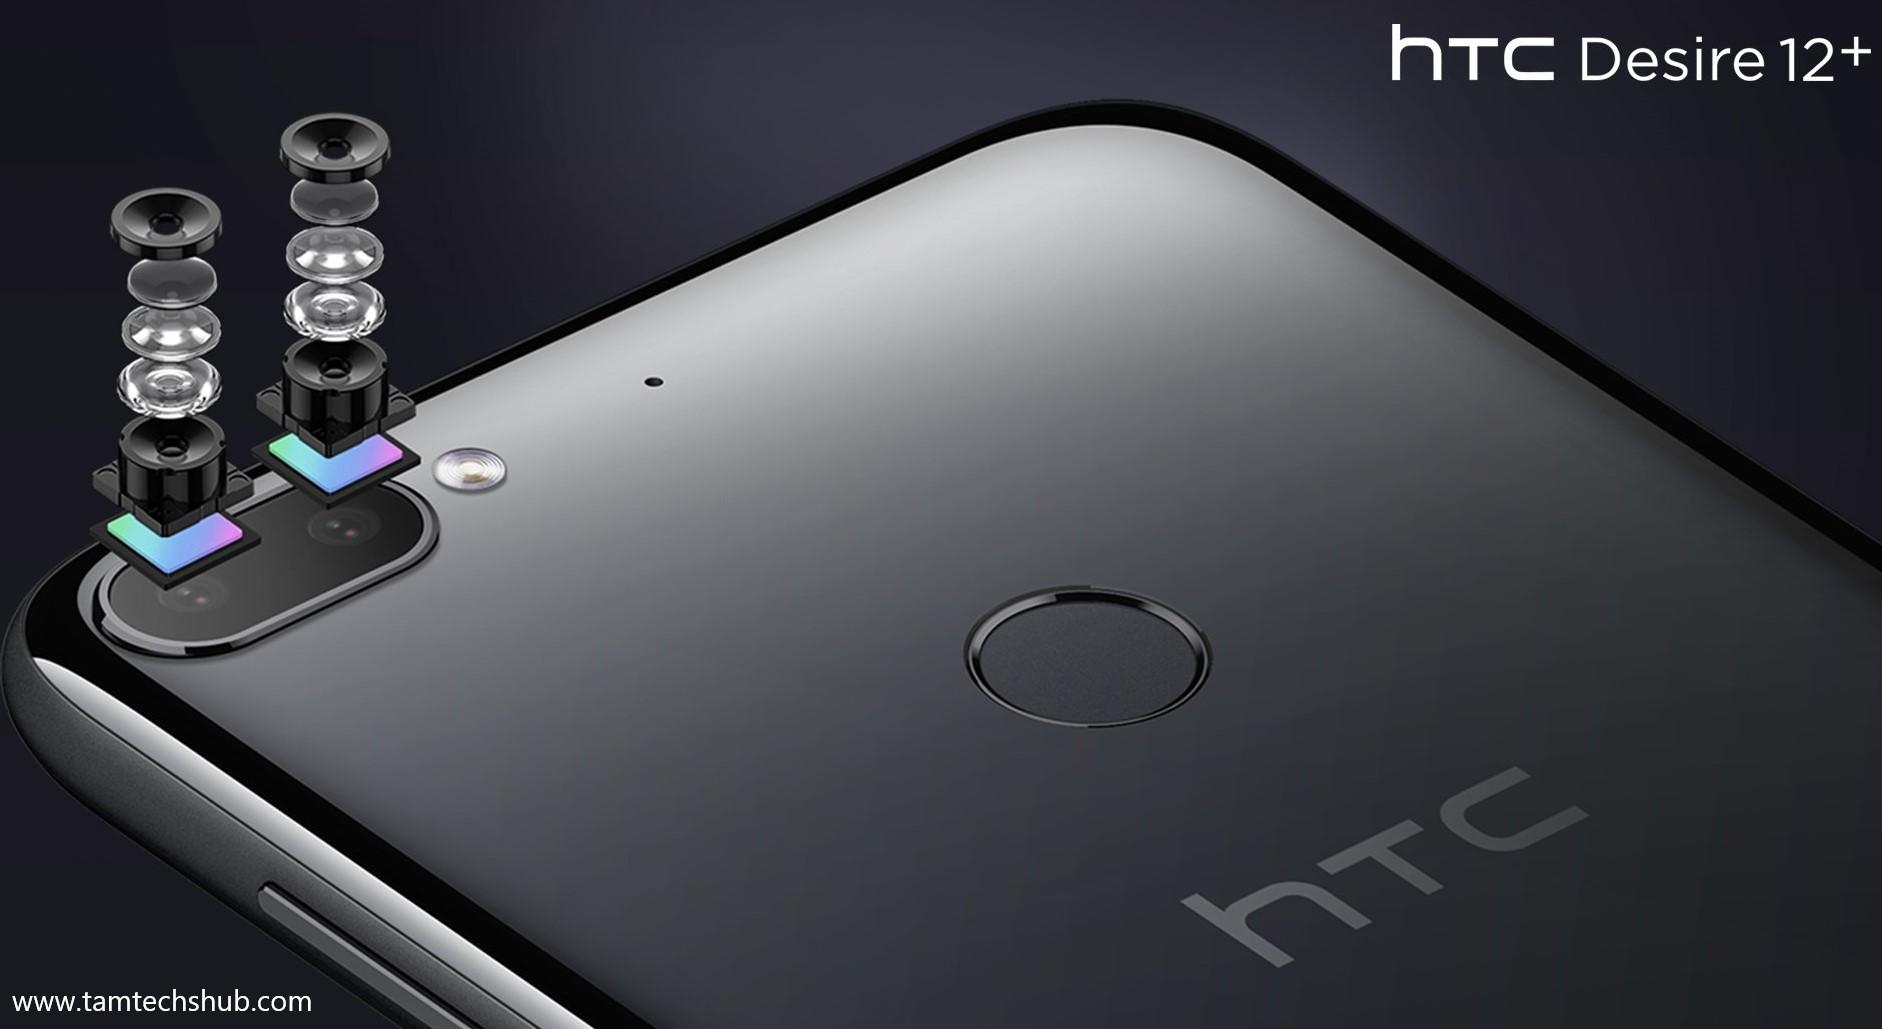 HTC Desire 12+ Smartphone Review